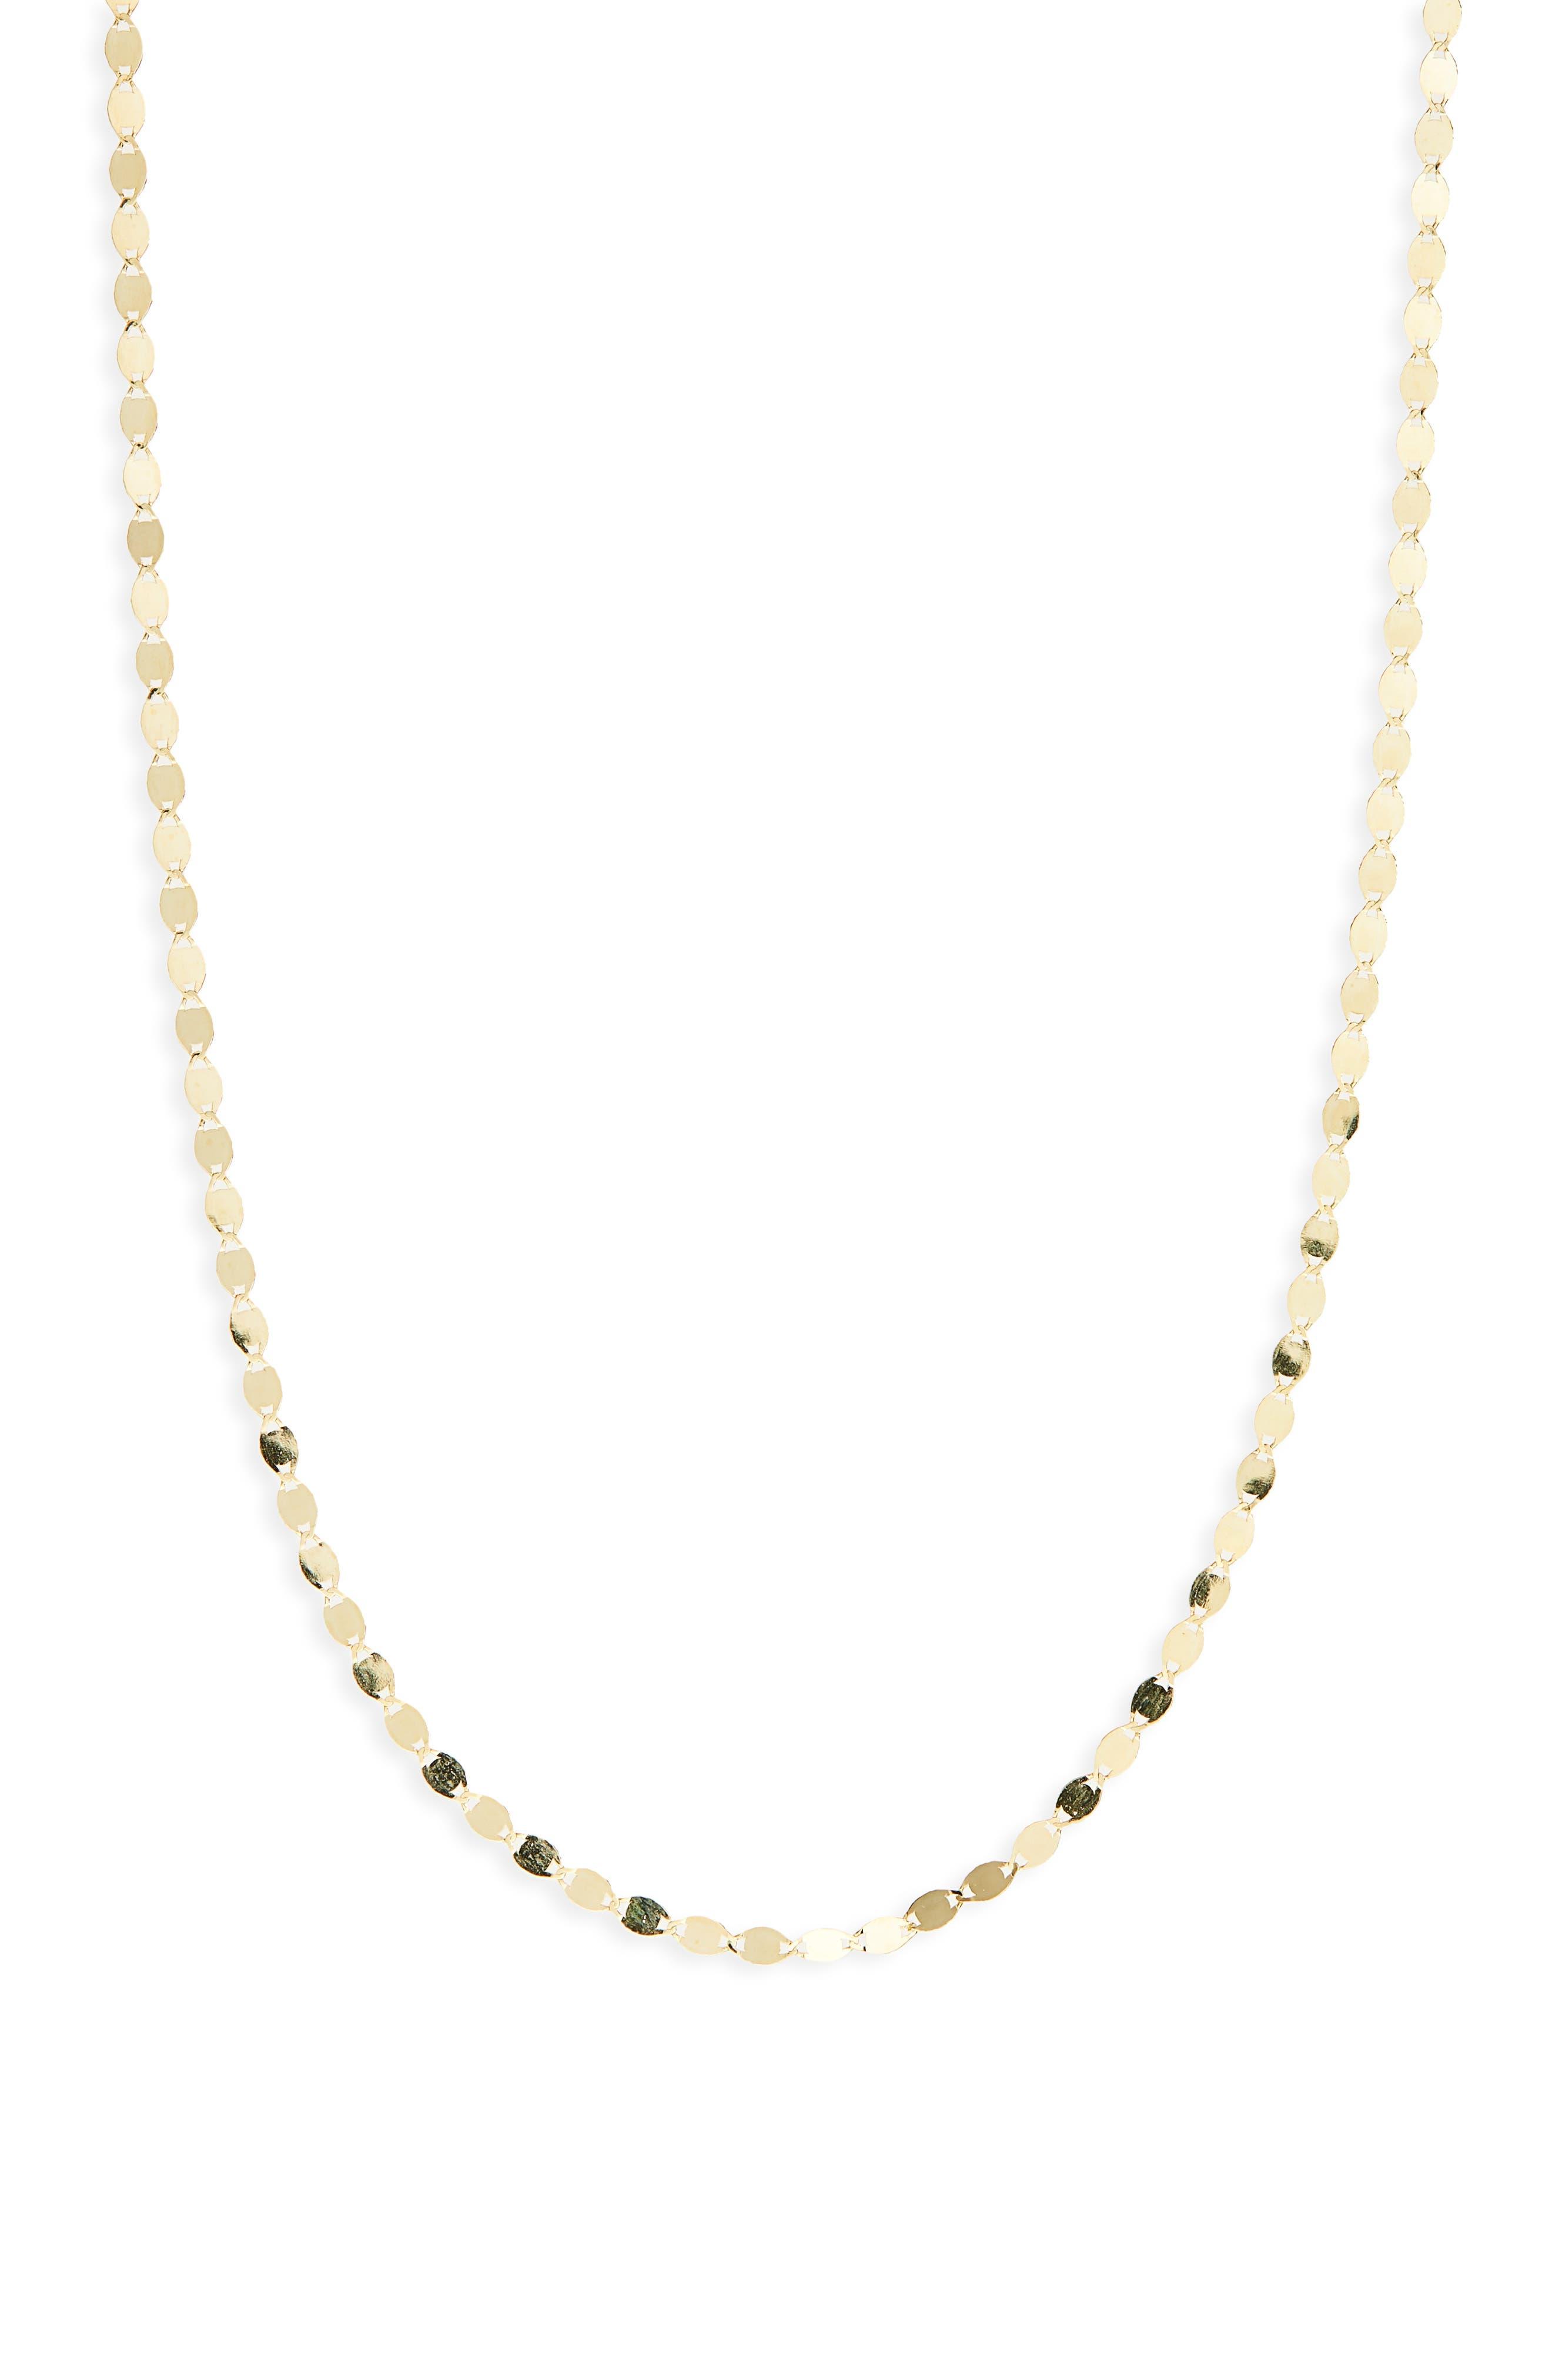 Petite Nude Chain Necklace